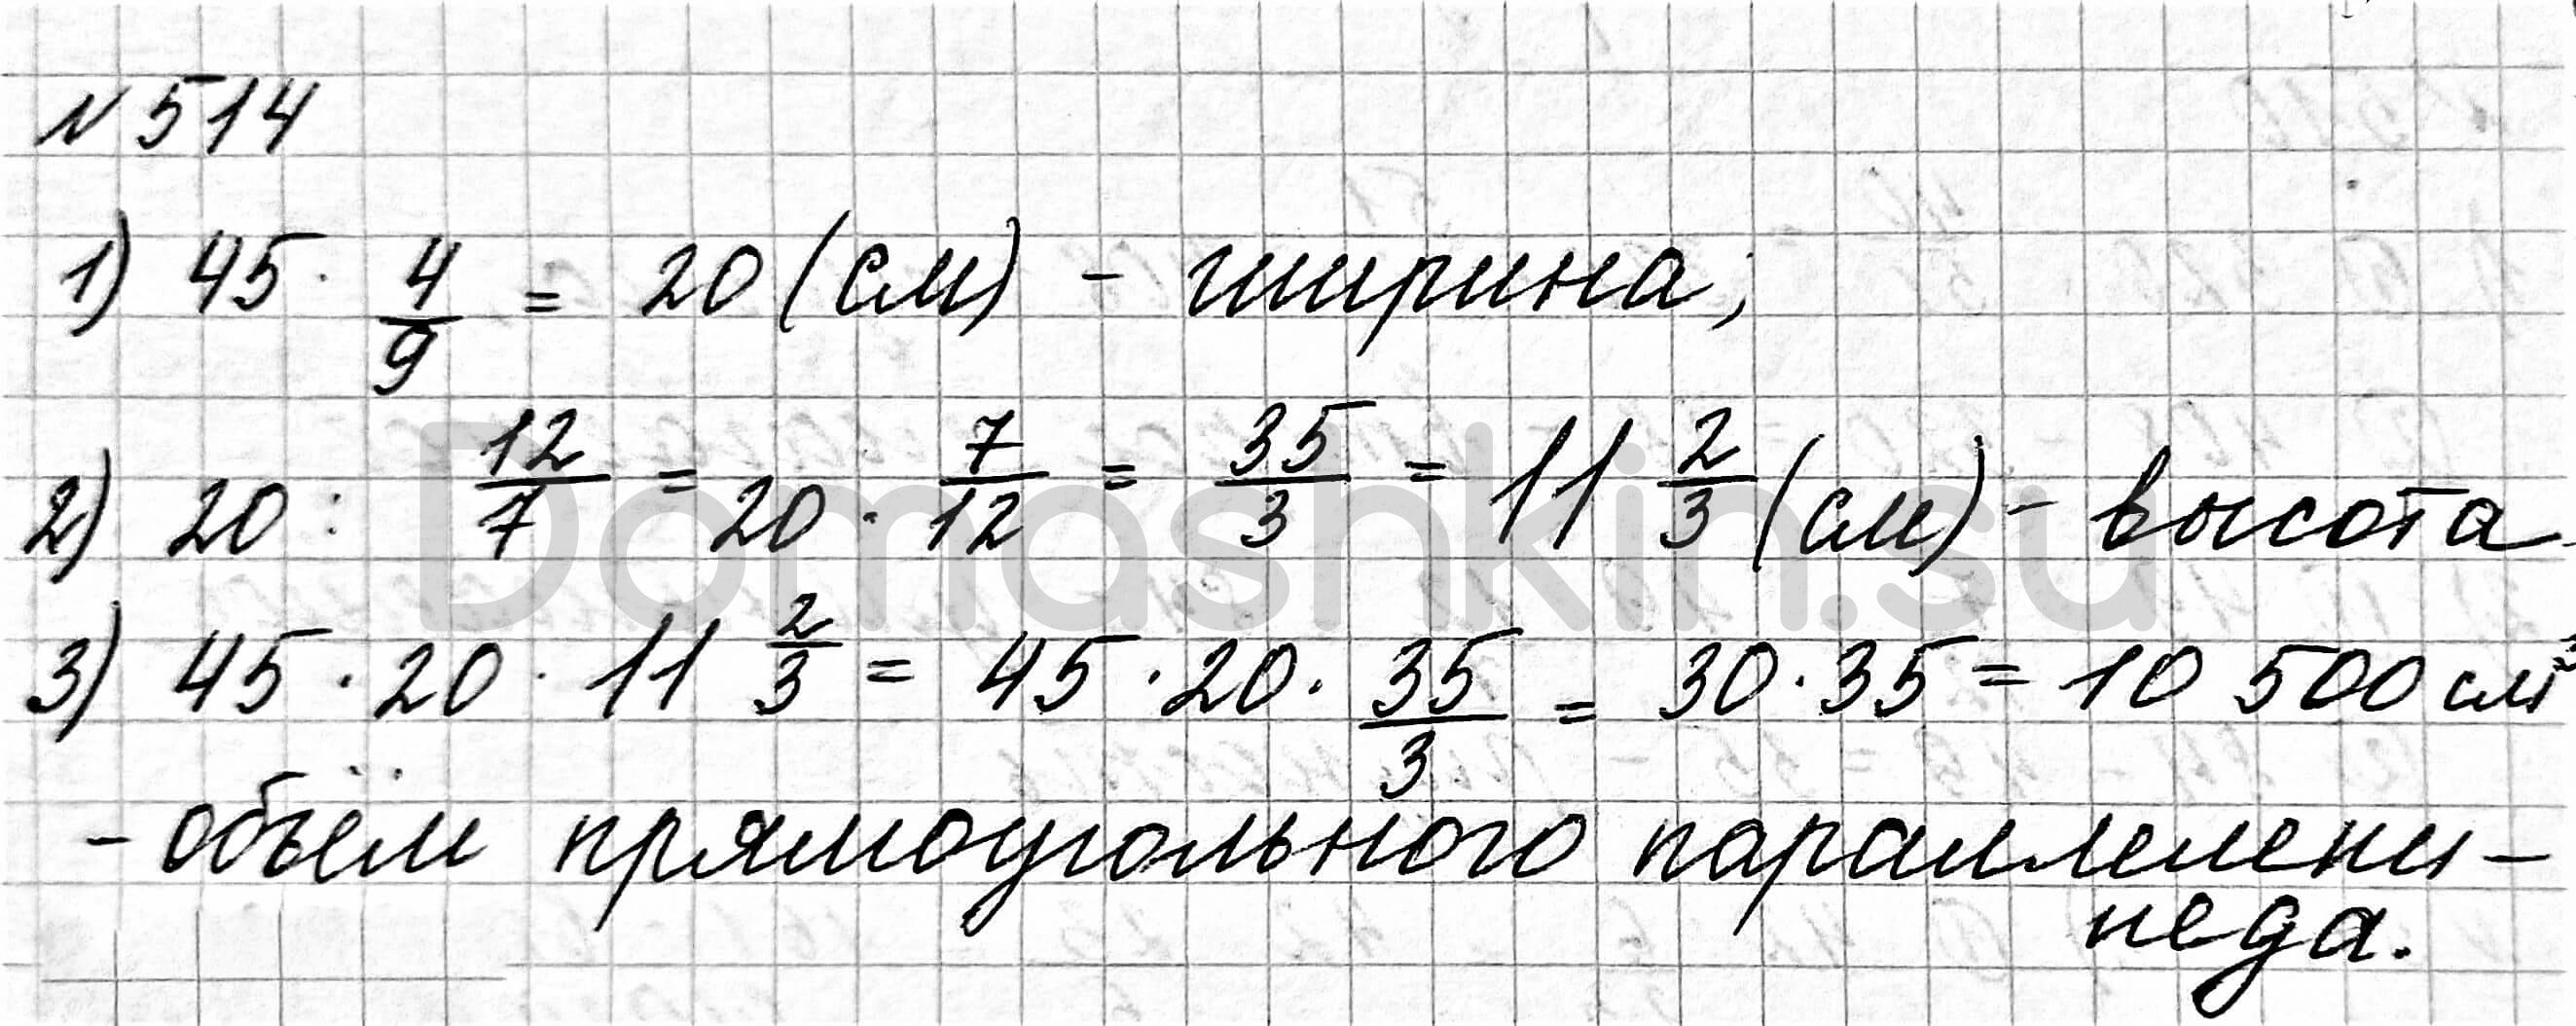 Математика 6 класс учебник Мерзляк номер 514 решение